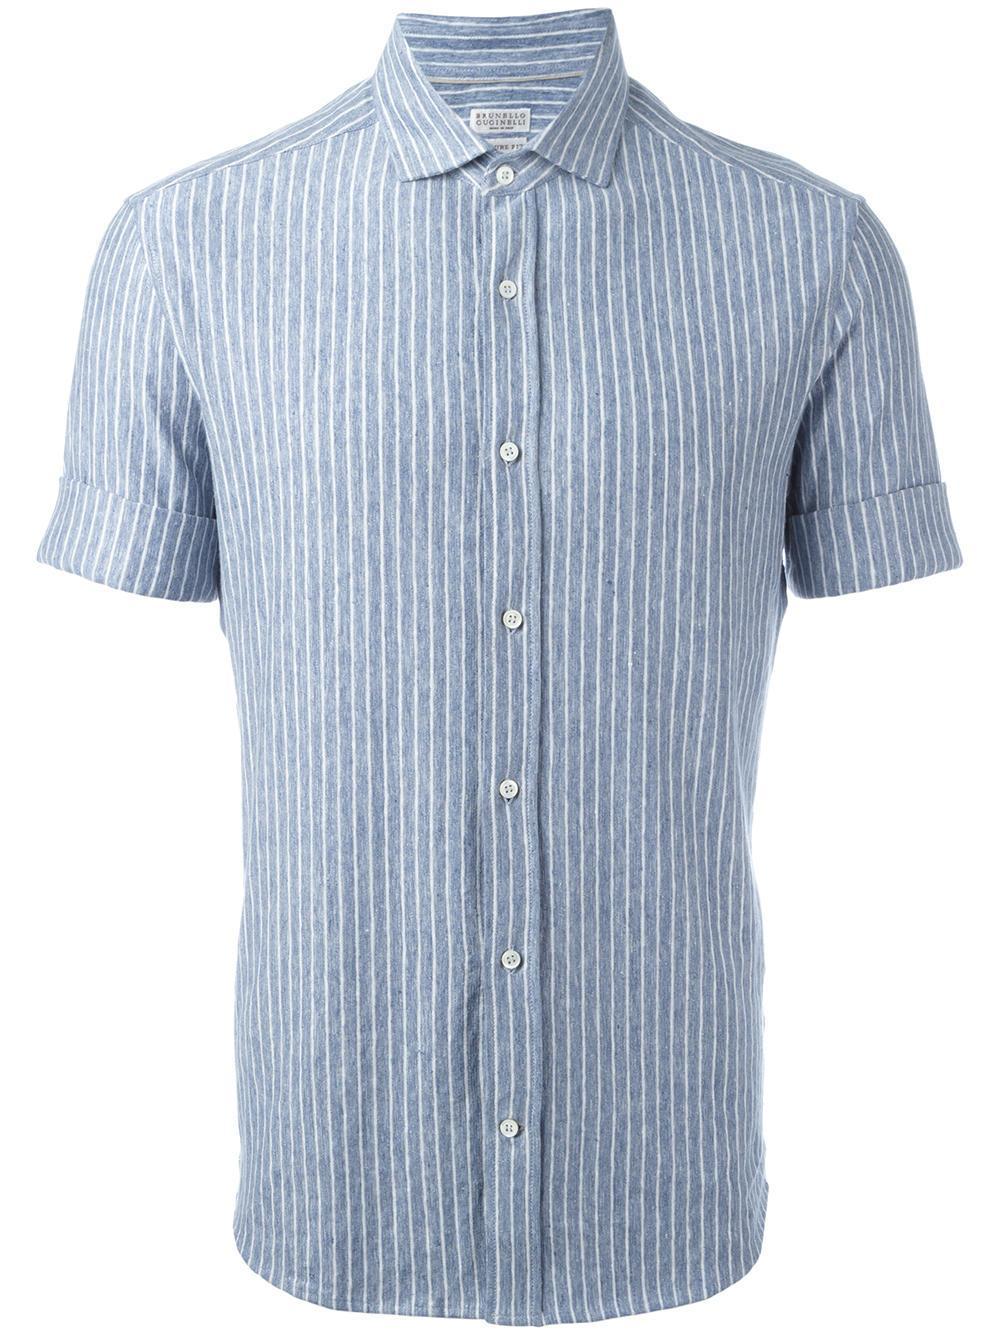 Brunello Cucinelli Striped Shirt In Blue For Men Lyst